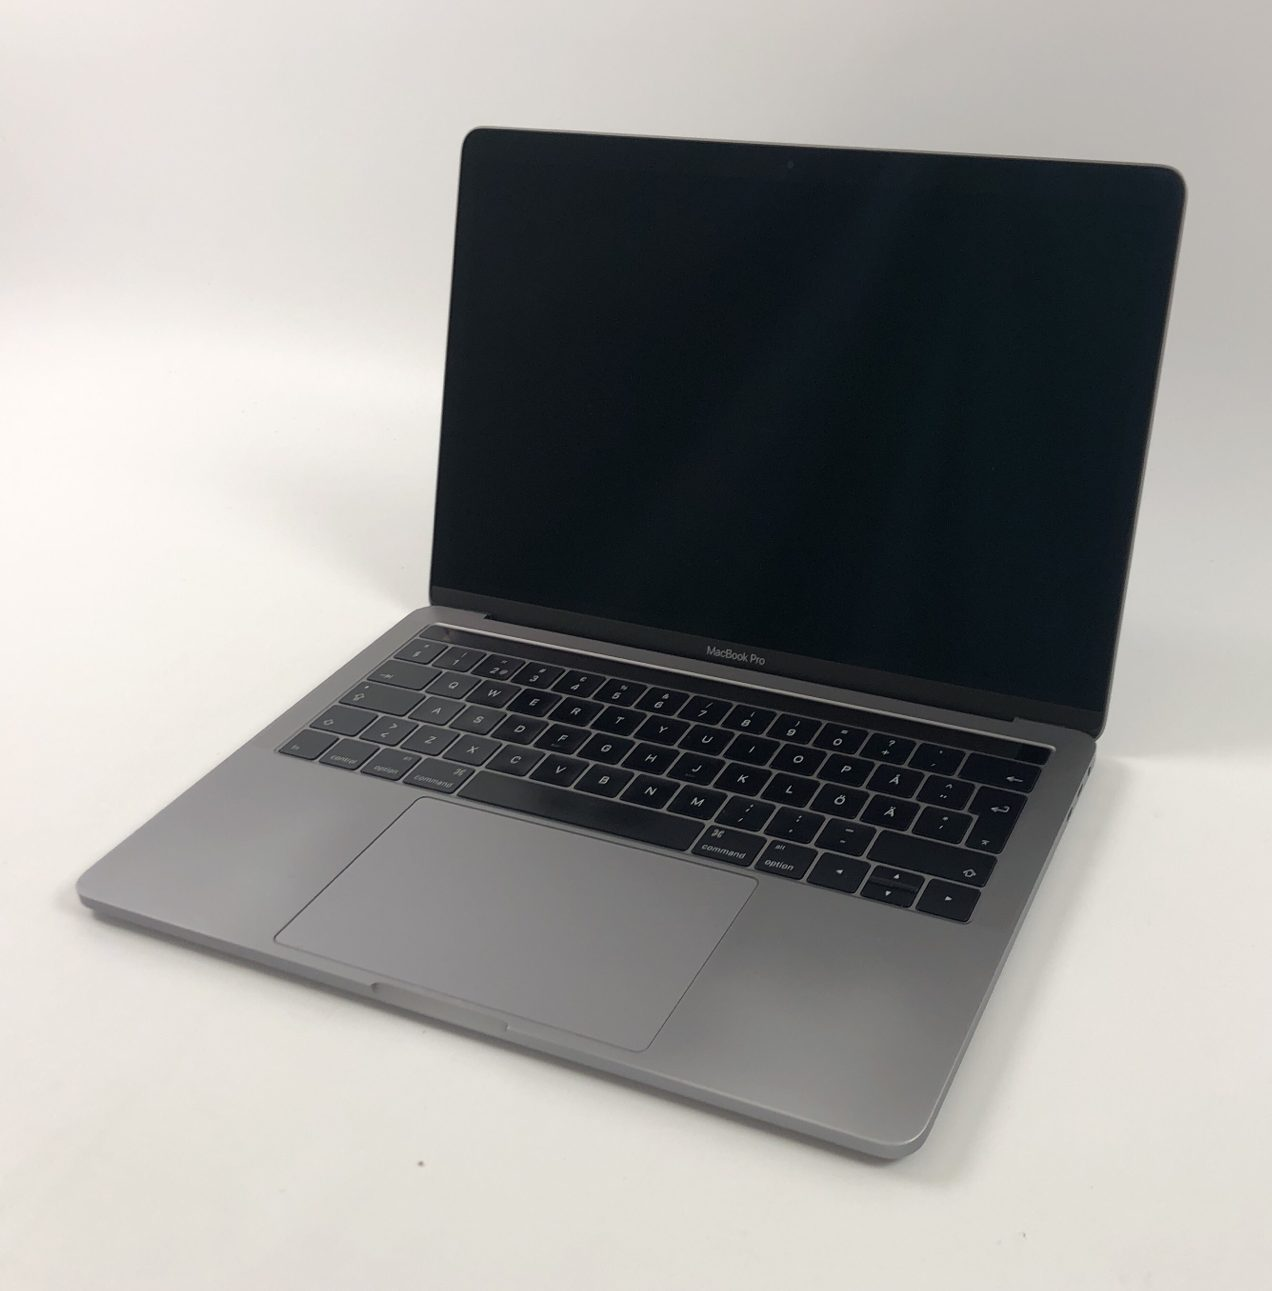 "MacBook Pro 13"" 4TBT Late 2016 (Intel Core i7 3.3 GHz 16 GB RAM 512 GB SSD), Space Gray, Intel Core i7 3.3 GHz, 16 GB RAM, 512 GB SSD, Kuva 1"